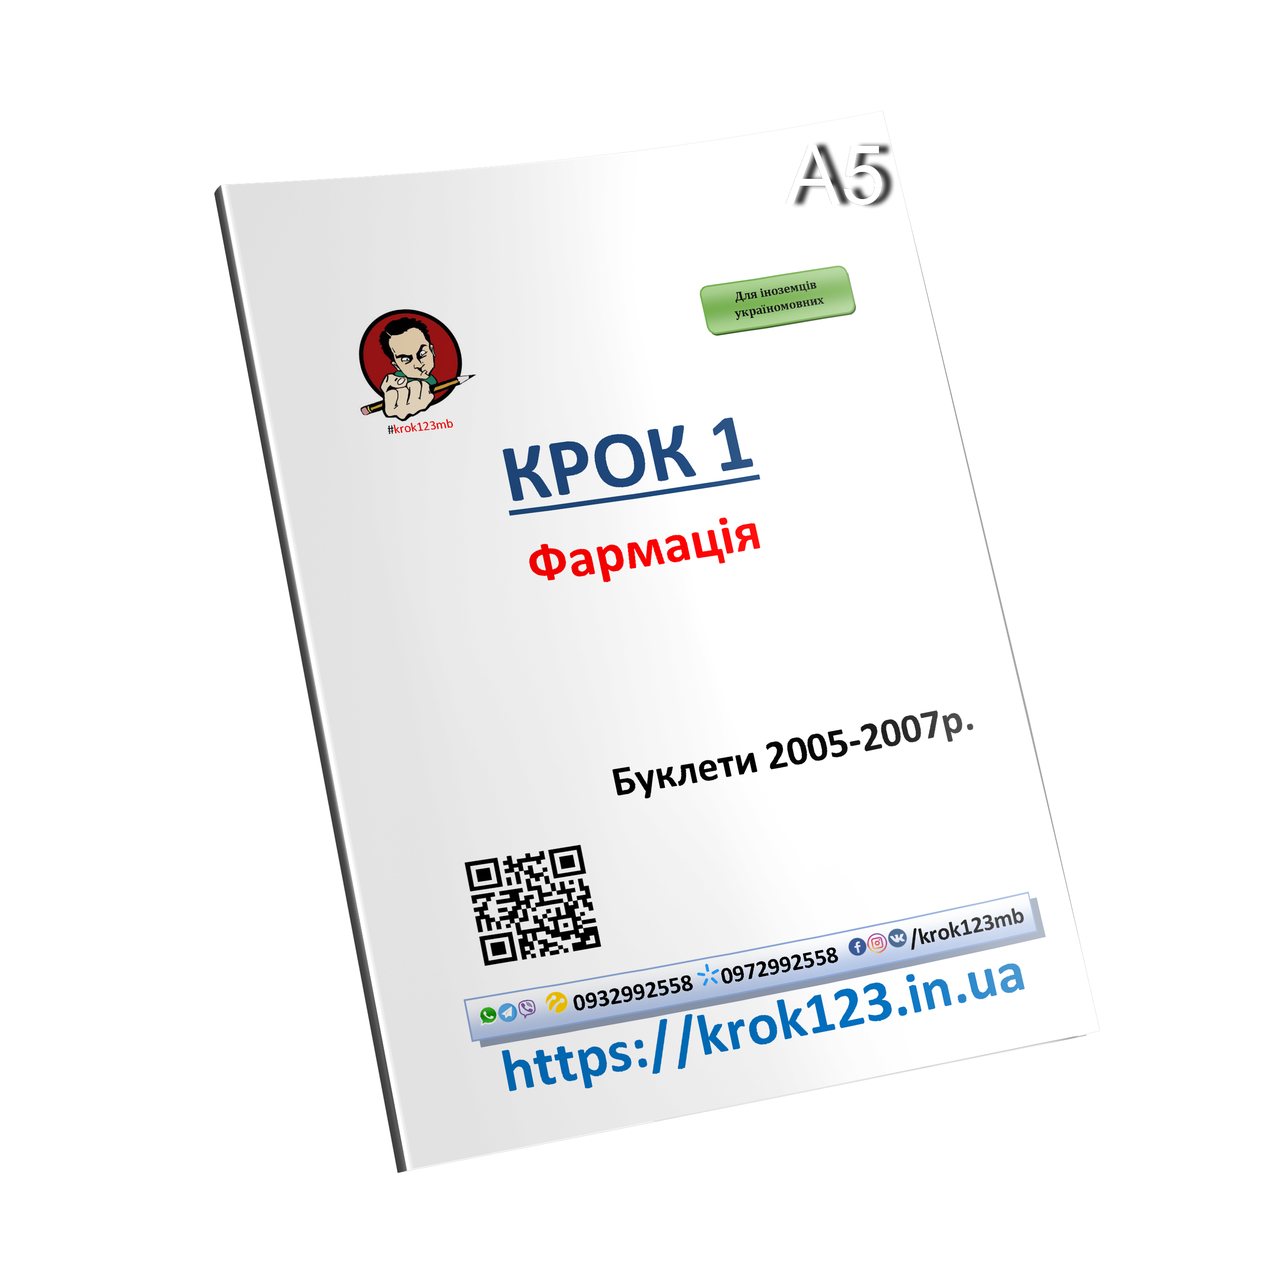 Крок 1. Фармация. Буклеты 2005-2007 . Для иностранцев украиноязычных. Формат А5